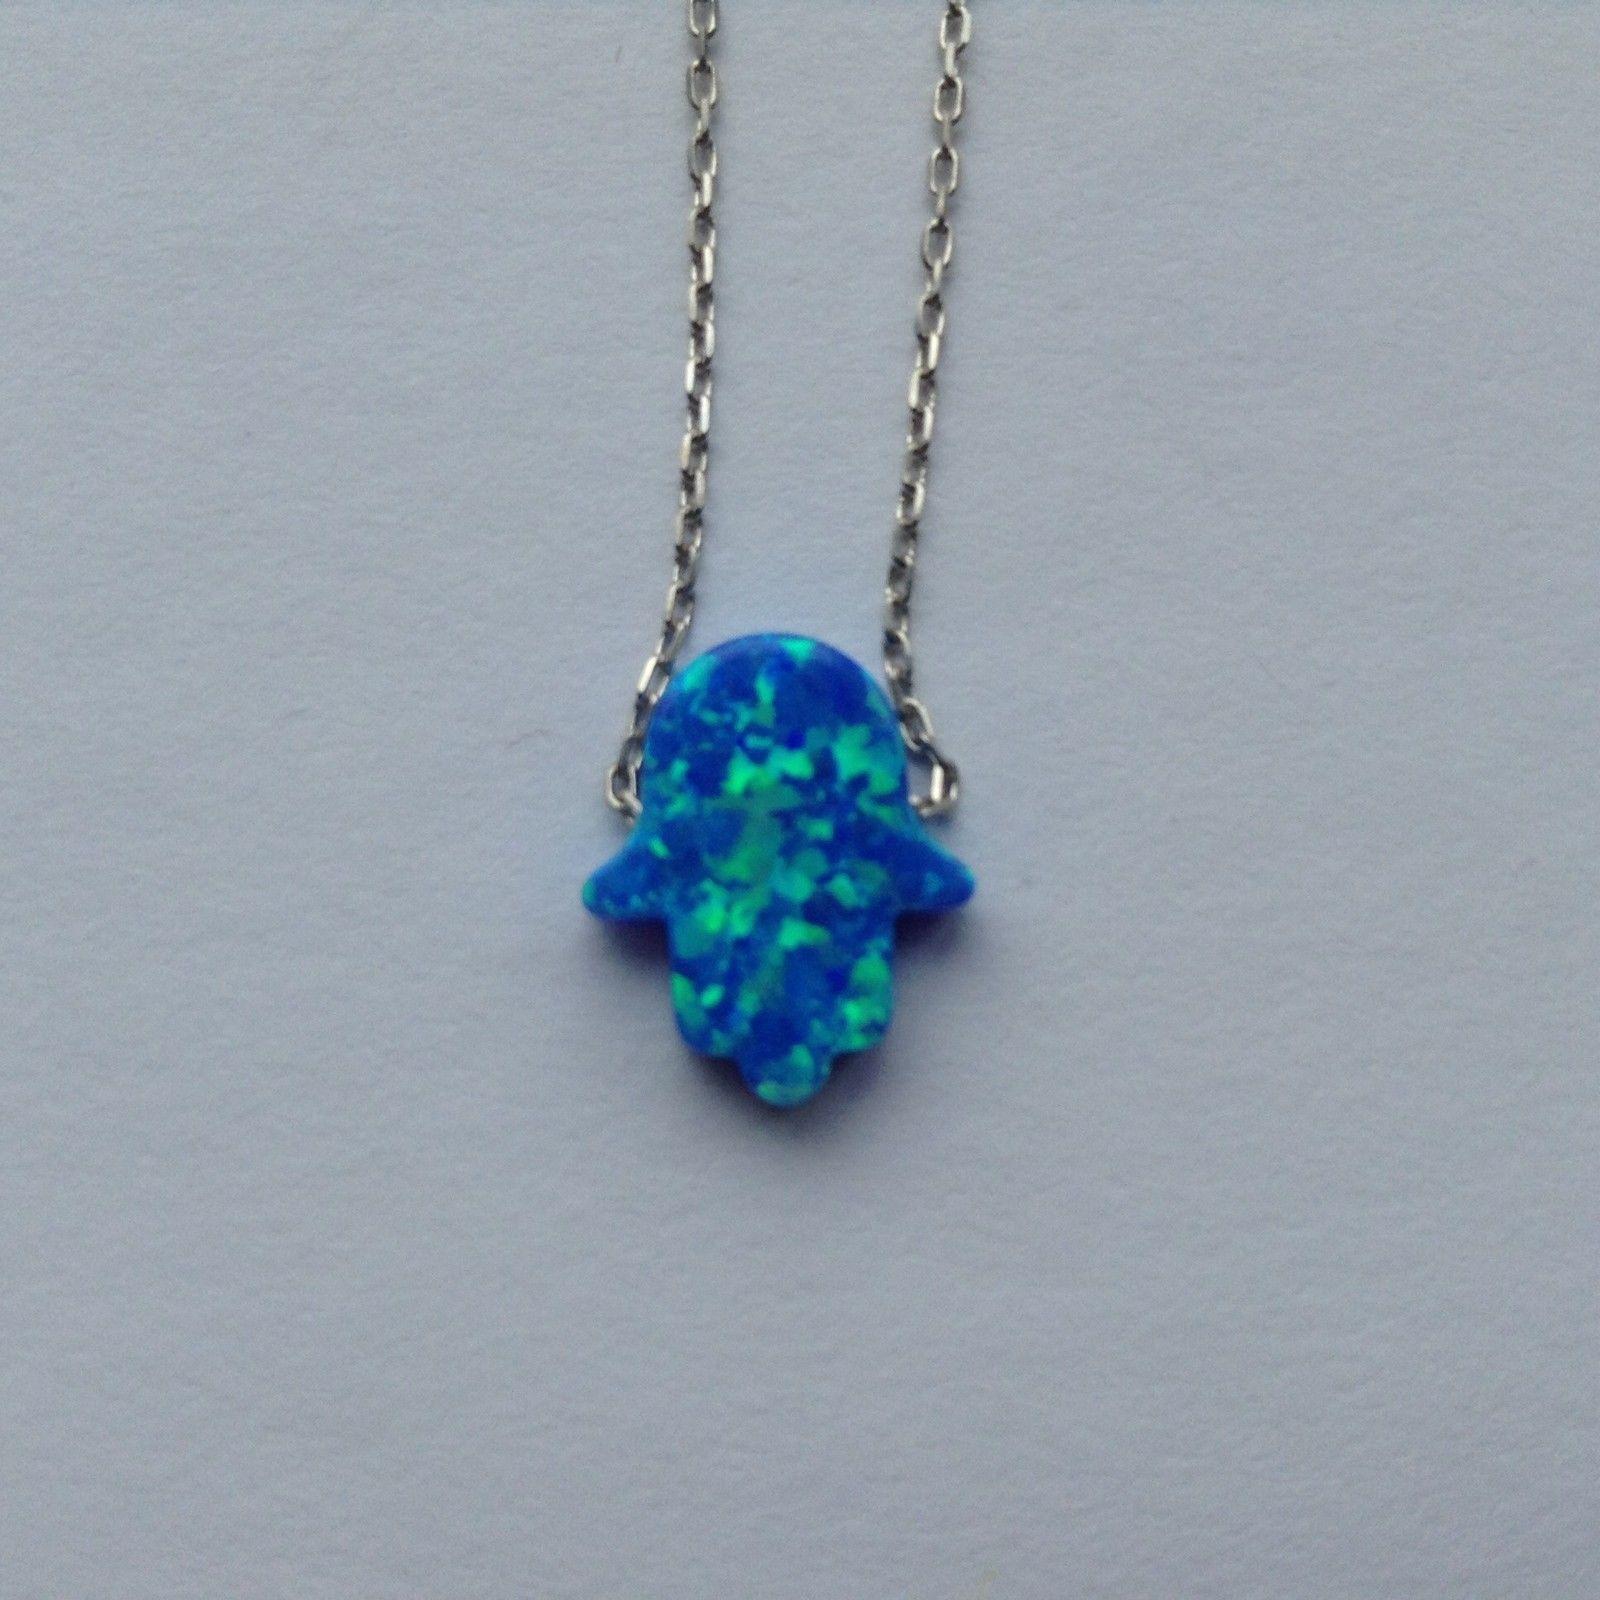 Hamsa Fatima Hand Sterling Silver Blue Opal Stone Necklace